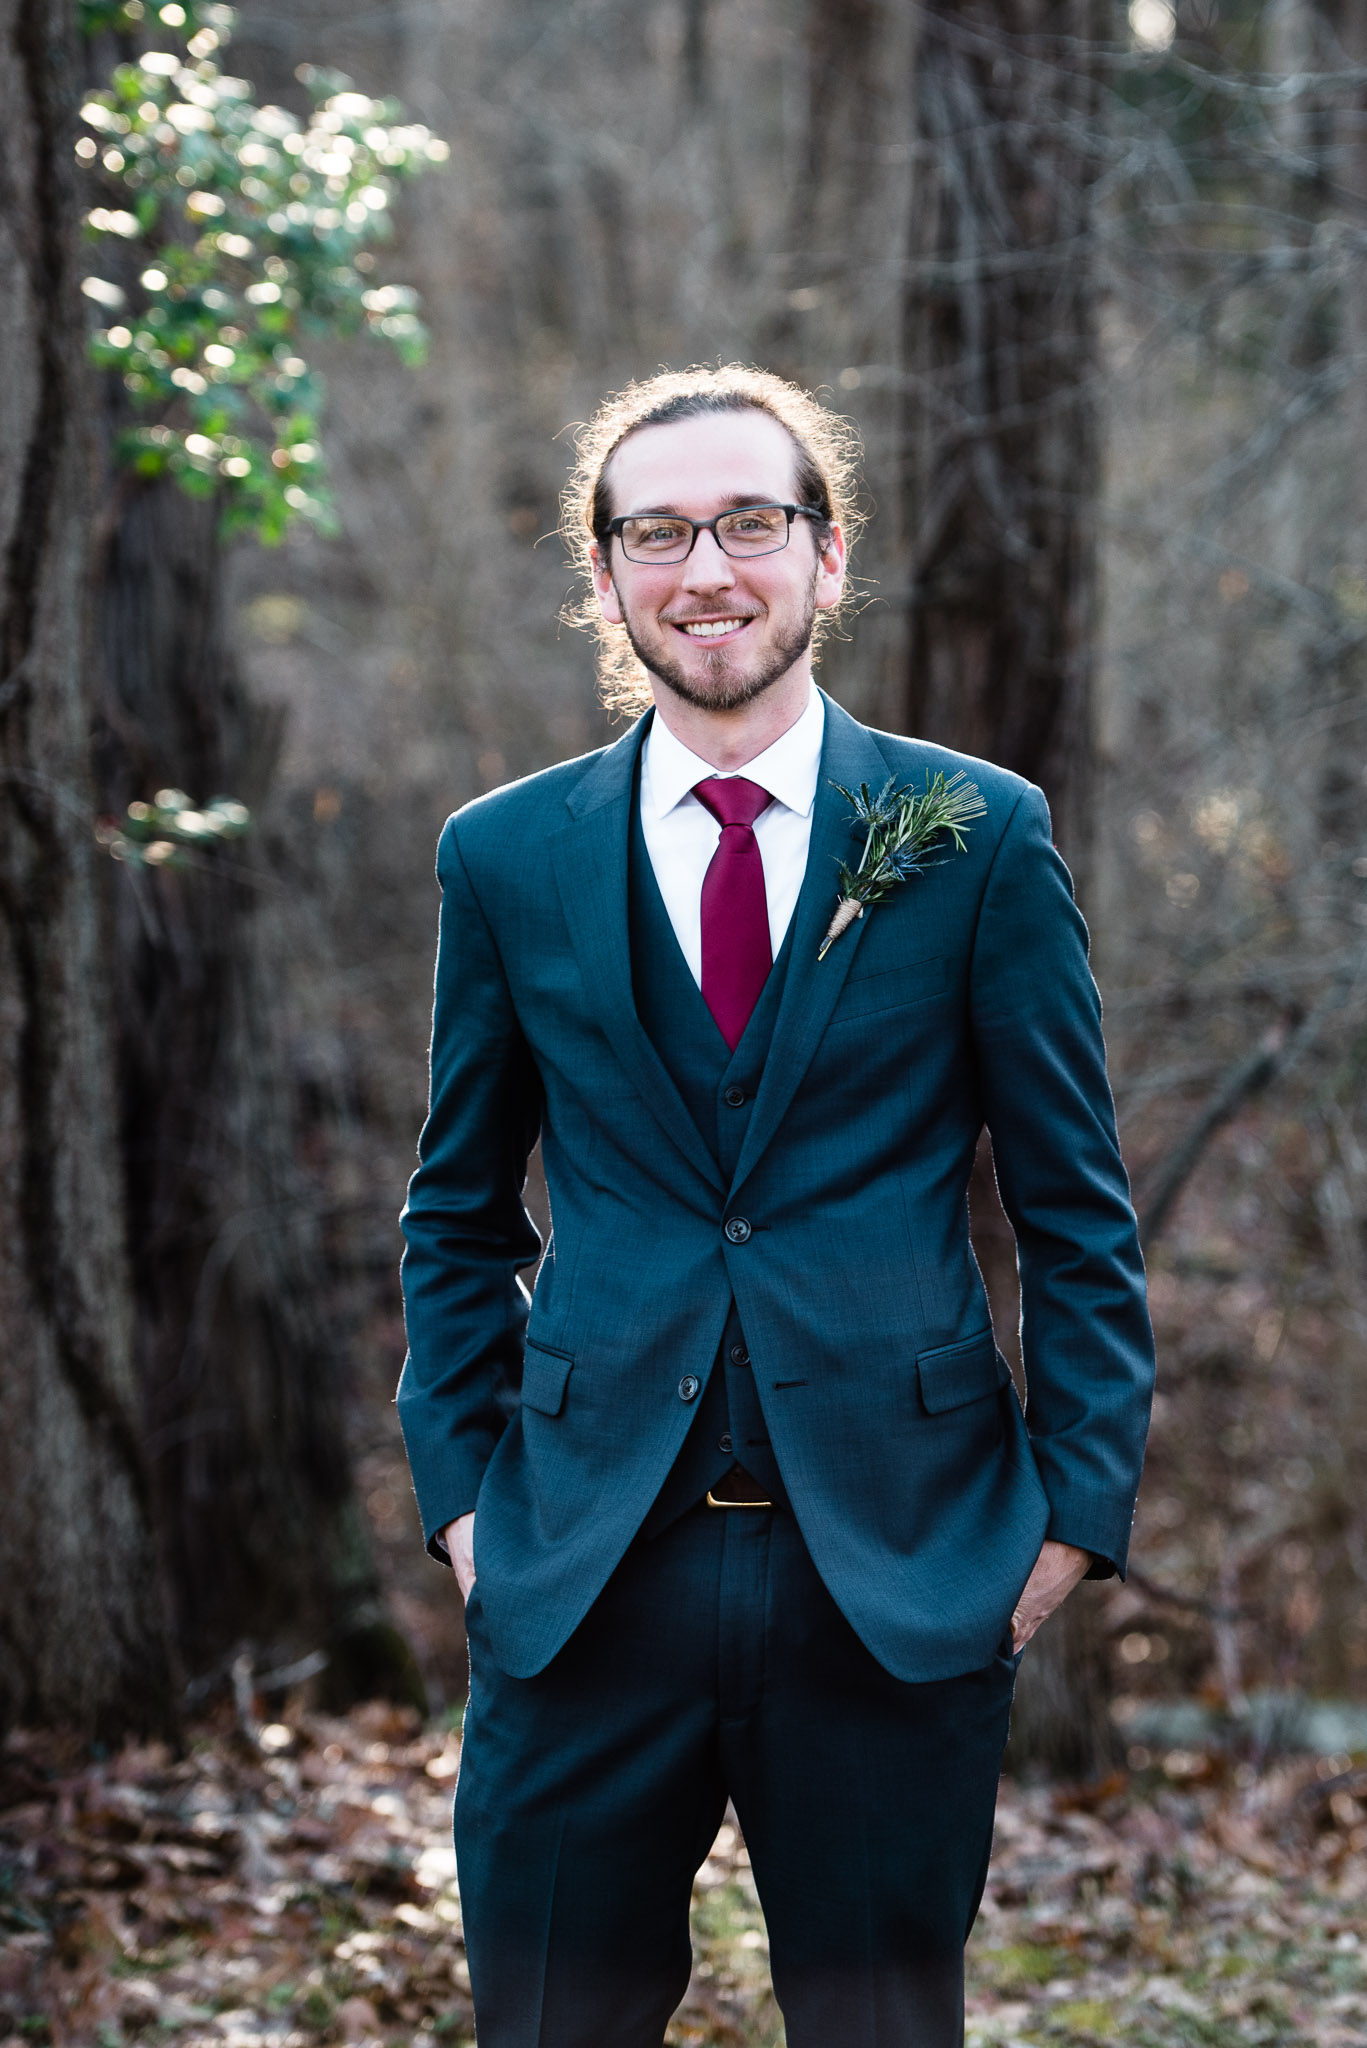 Ligonier Wedding Photographer, Ligonier PA wedding, wedding potraits-1154.jpg